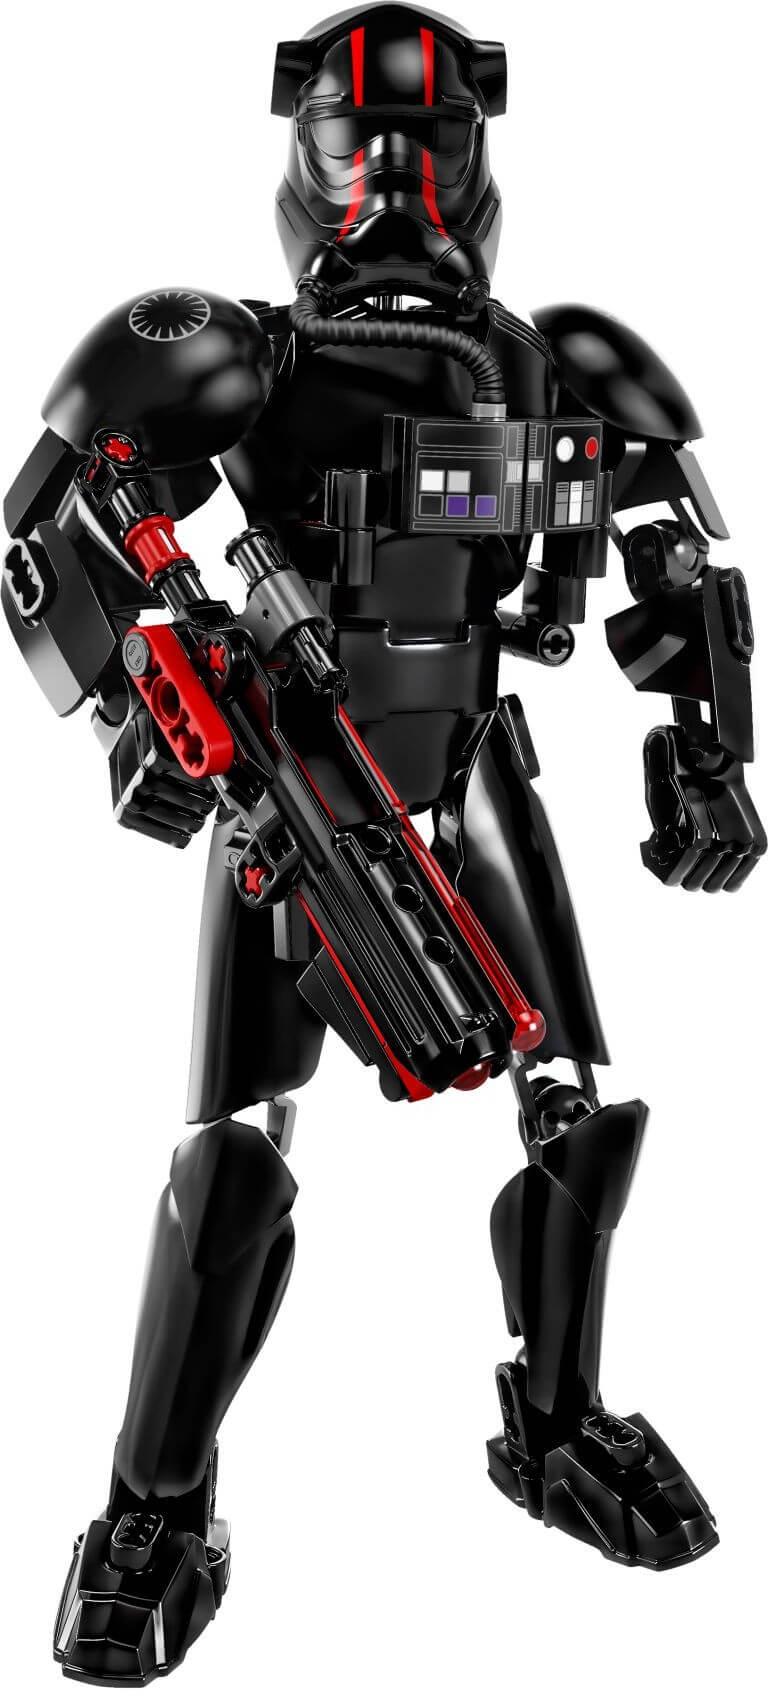 Mua đồ chơi LEGO 75526 - LEGO Star Wars 75526 - Phi Công Máy Bay TIE - Elite TIE Fighter Pilot